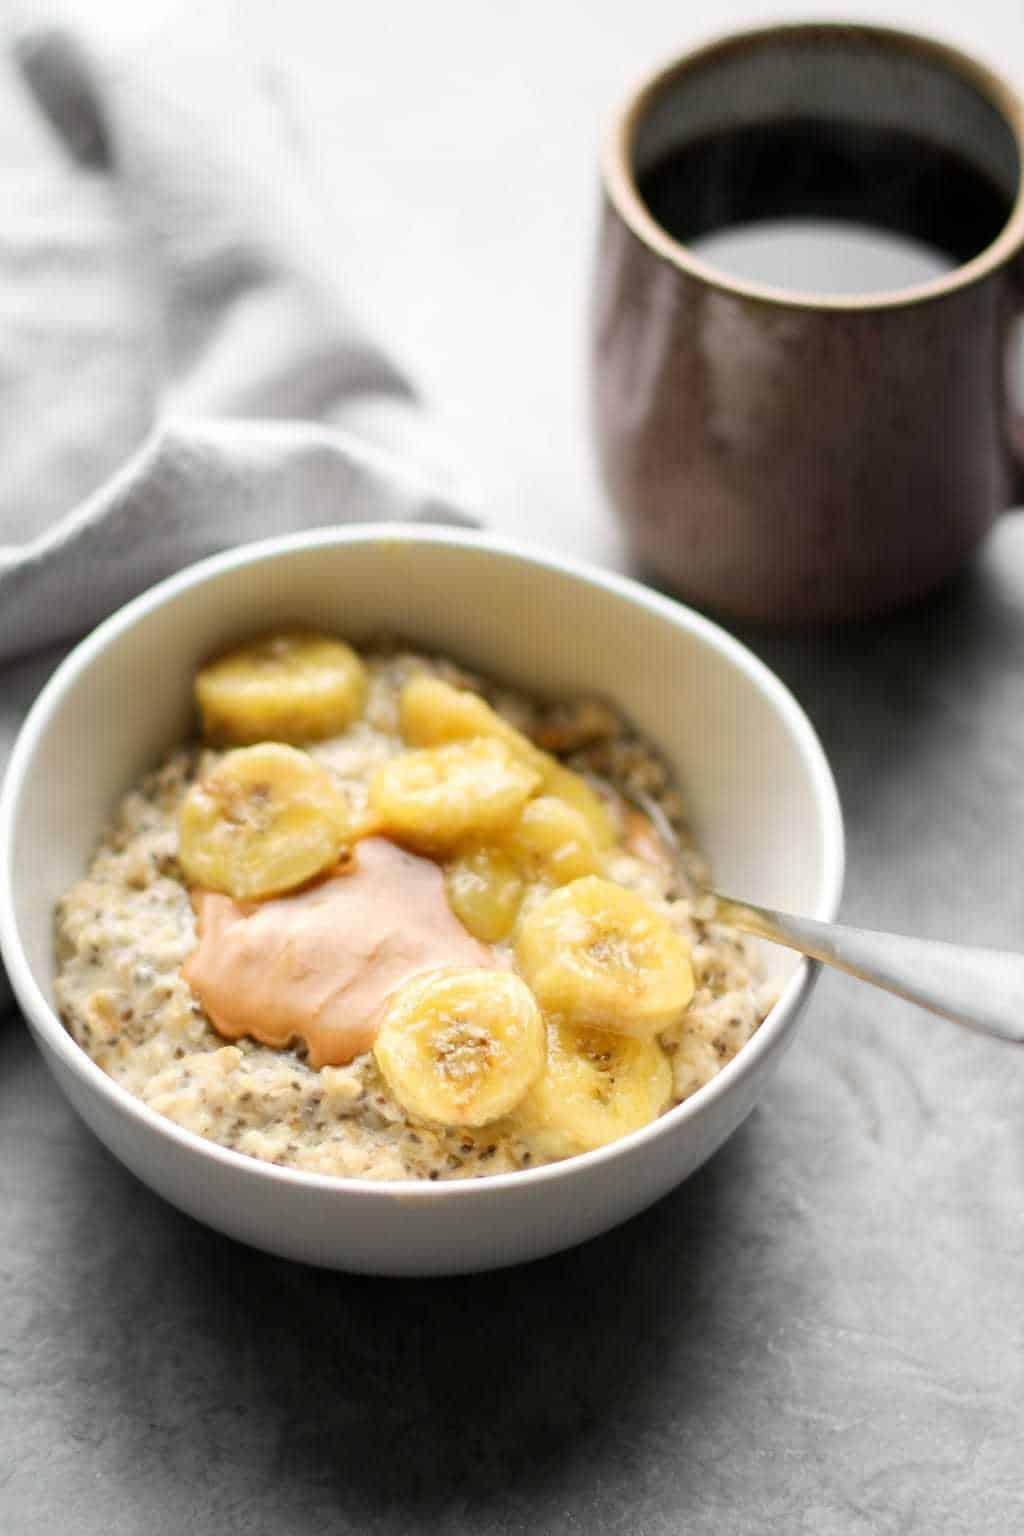 Sugar-Free Caramelized Banana Oatmeal